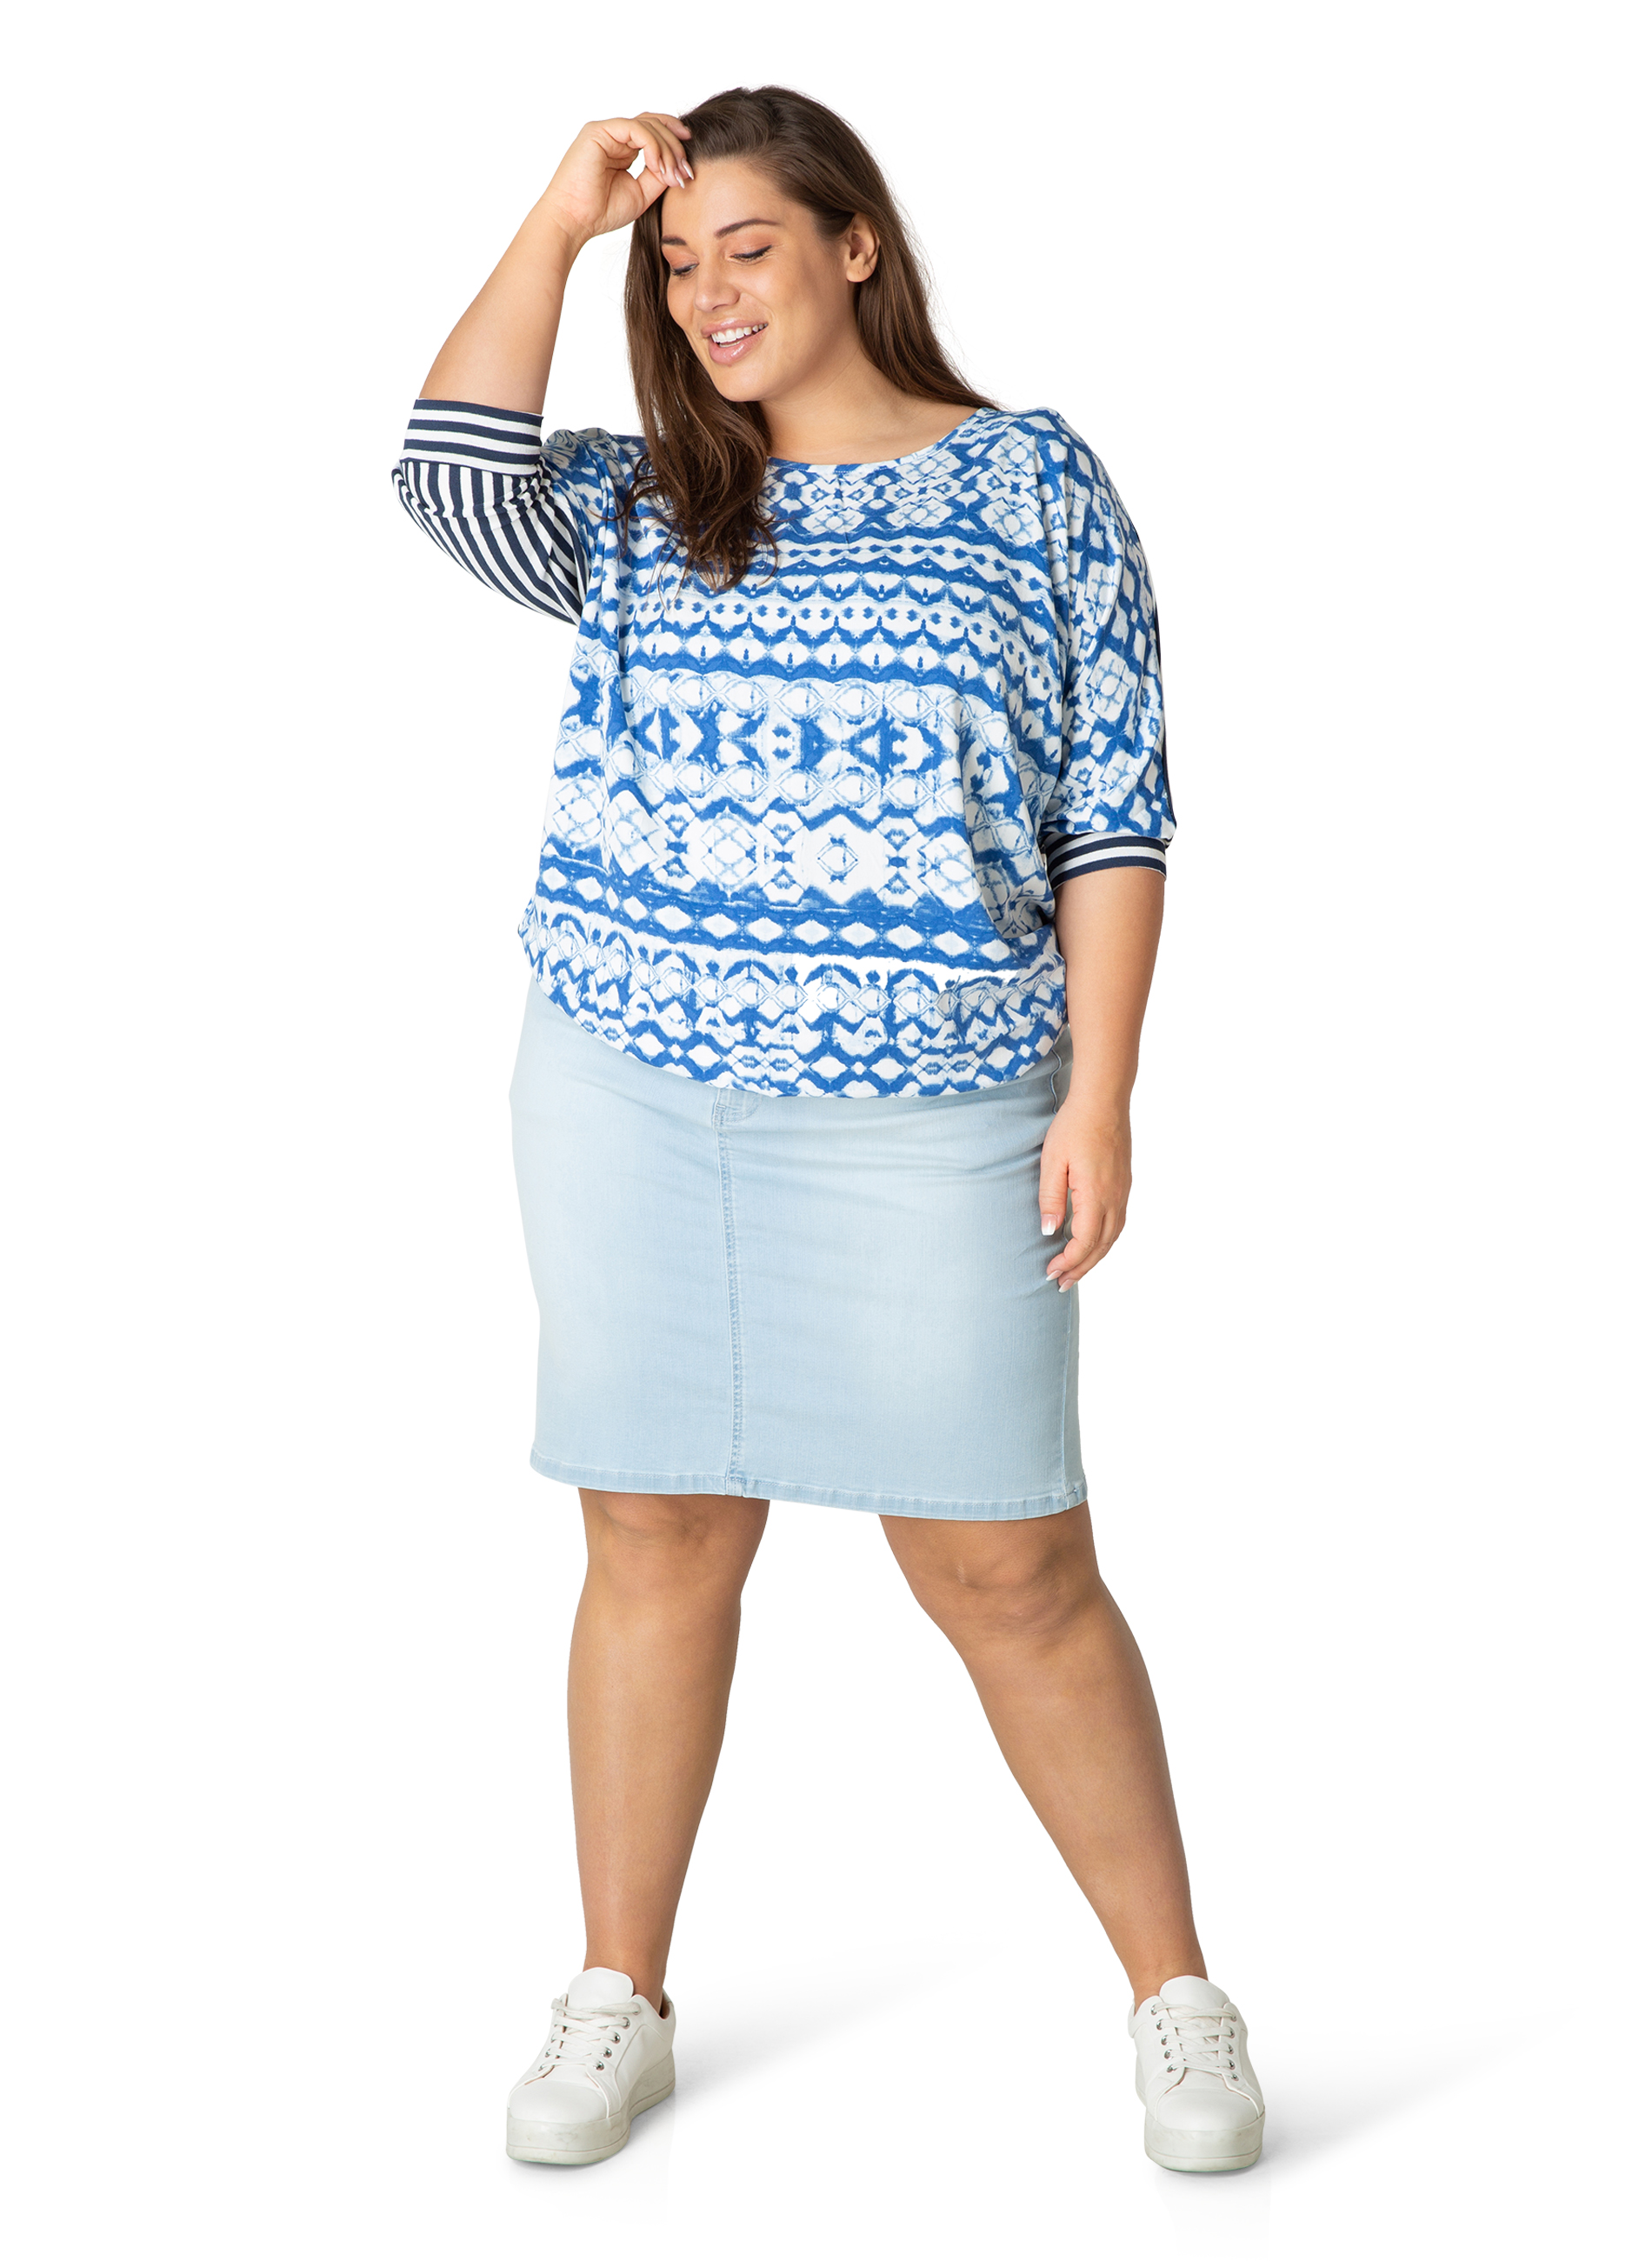 Shirt Joanna 66 cm Yesta